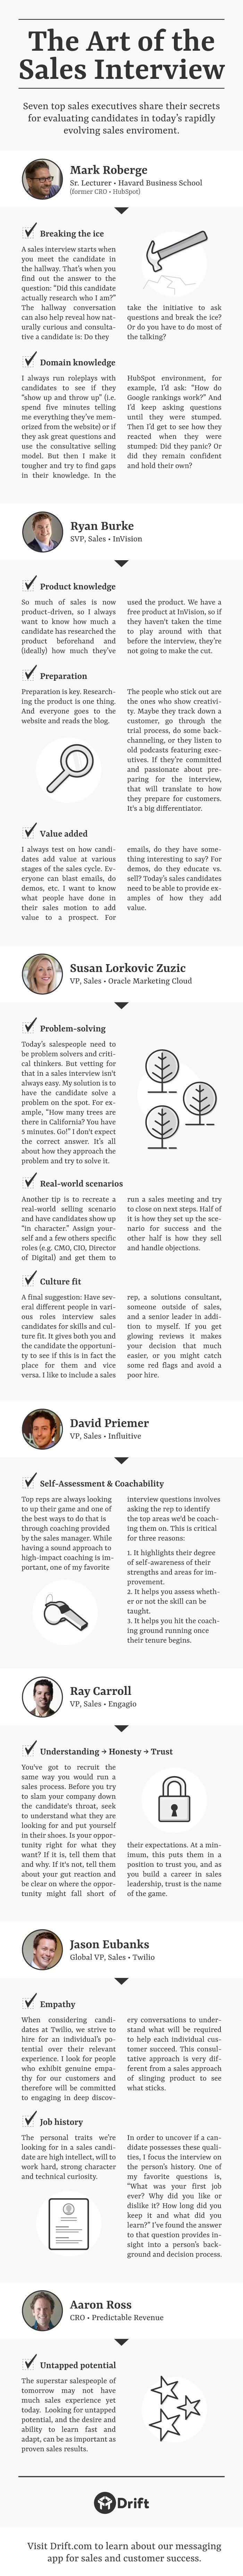 sales-interview-infographic-v1_mini.jpg